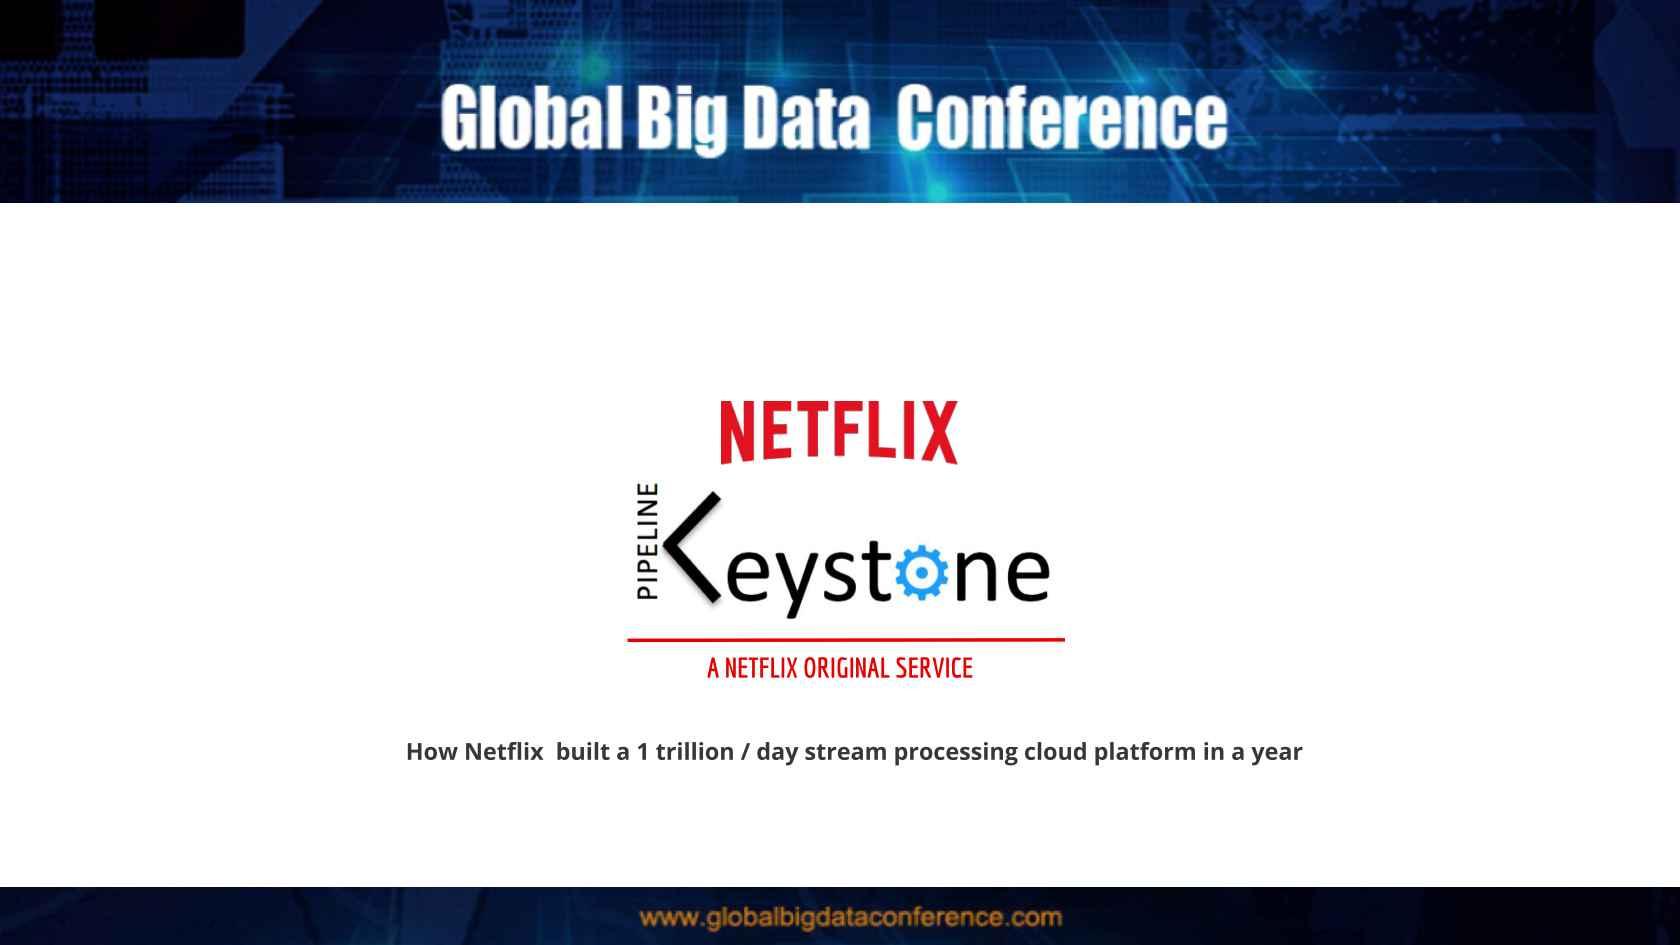 Netflix Keystone - How We Built a 700B/day Stream Processing